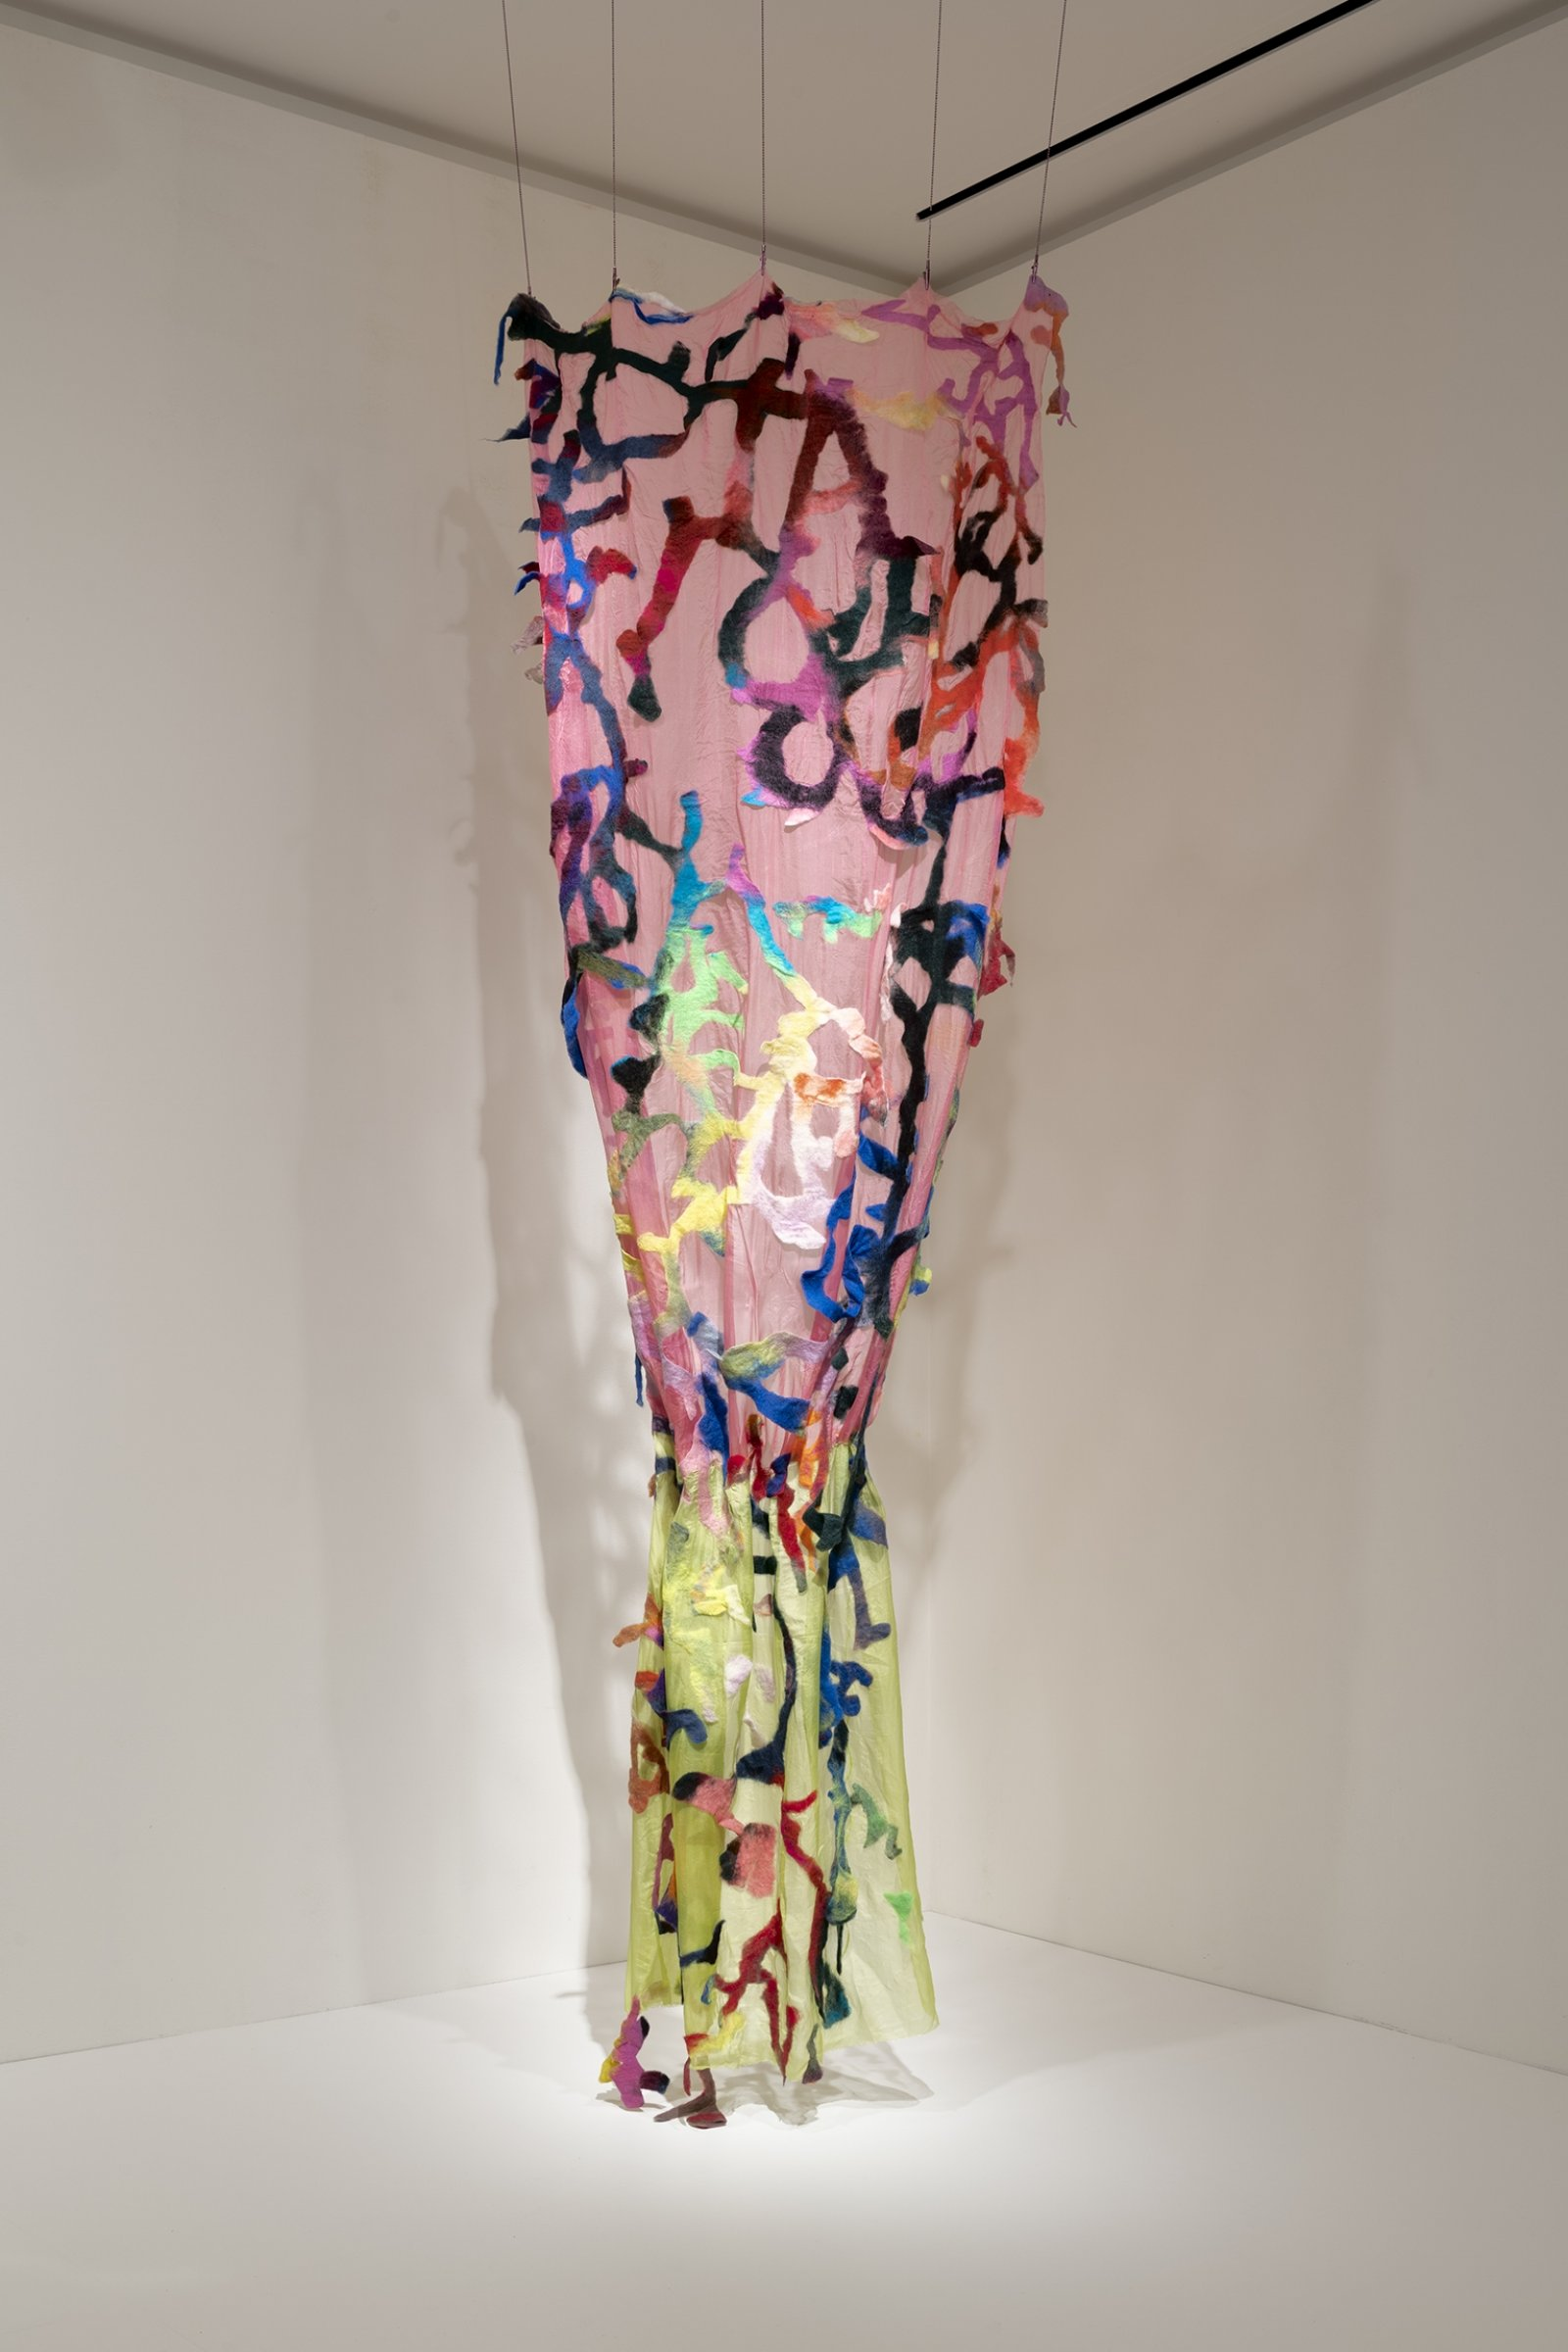 Rebecca Brewer, Total Loss, 2019, silk, wool felt, alligator clips, ball chain, 114 x 52 in. (290 x 132 cm). Installation view, Natural Horror, Frye Art Museum, Seattle, USA, 2020